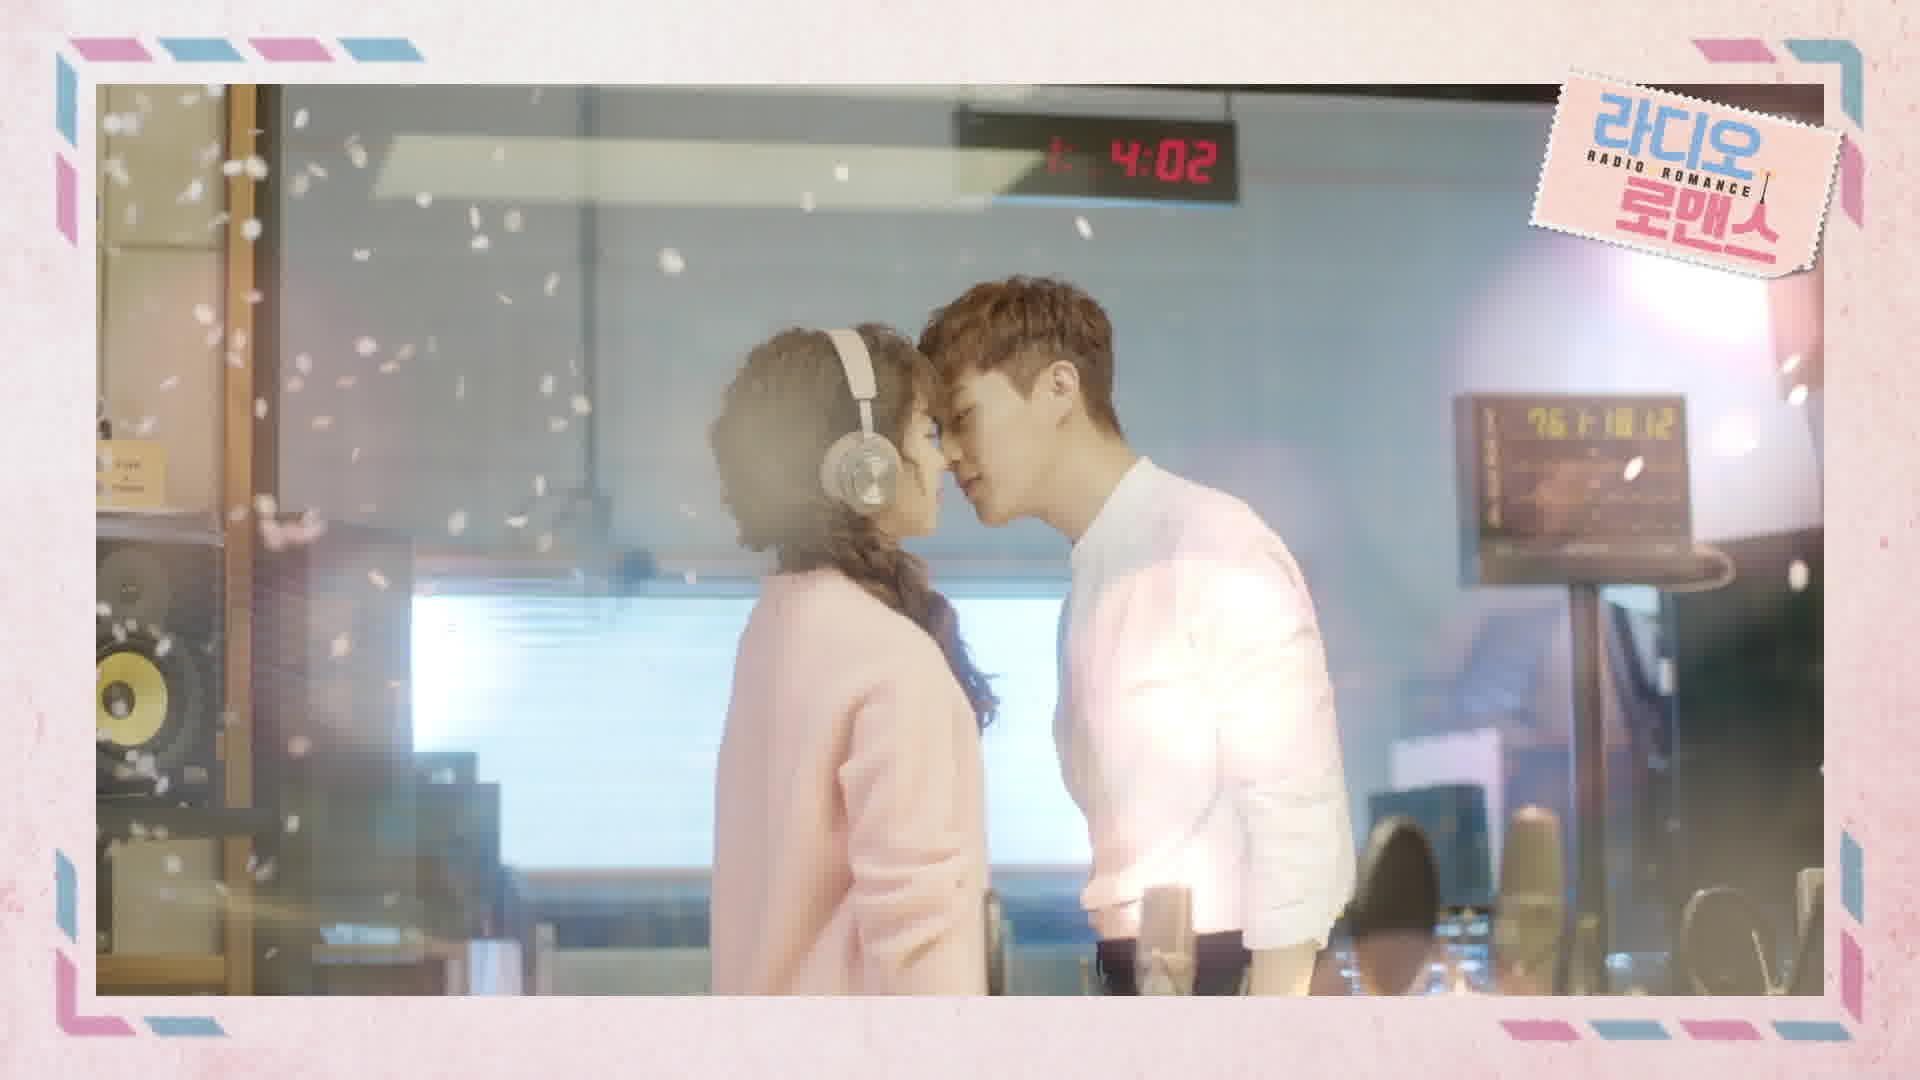 Radio Romance Episode 16 - 라디오 로맨스 - Watch Full